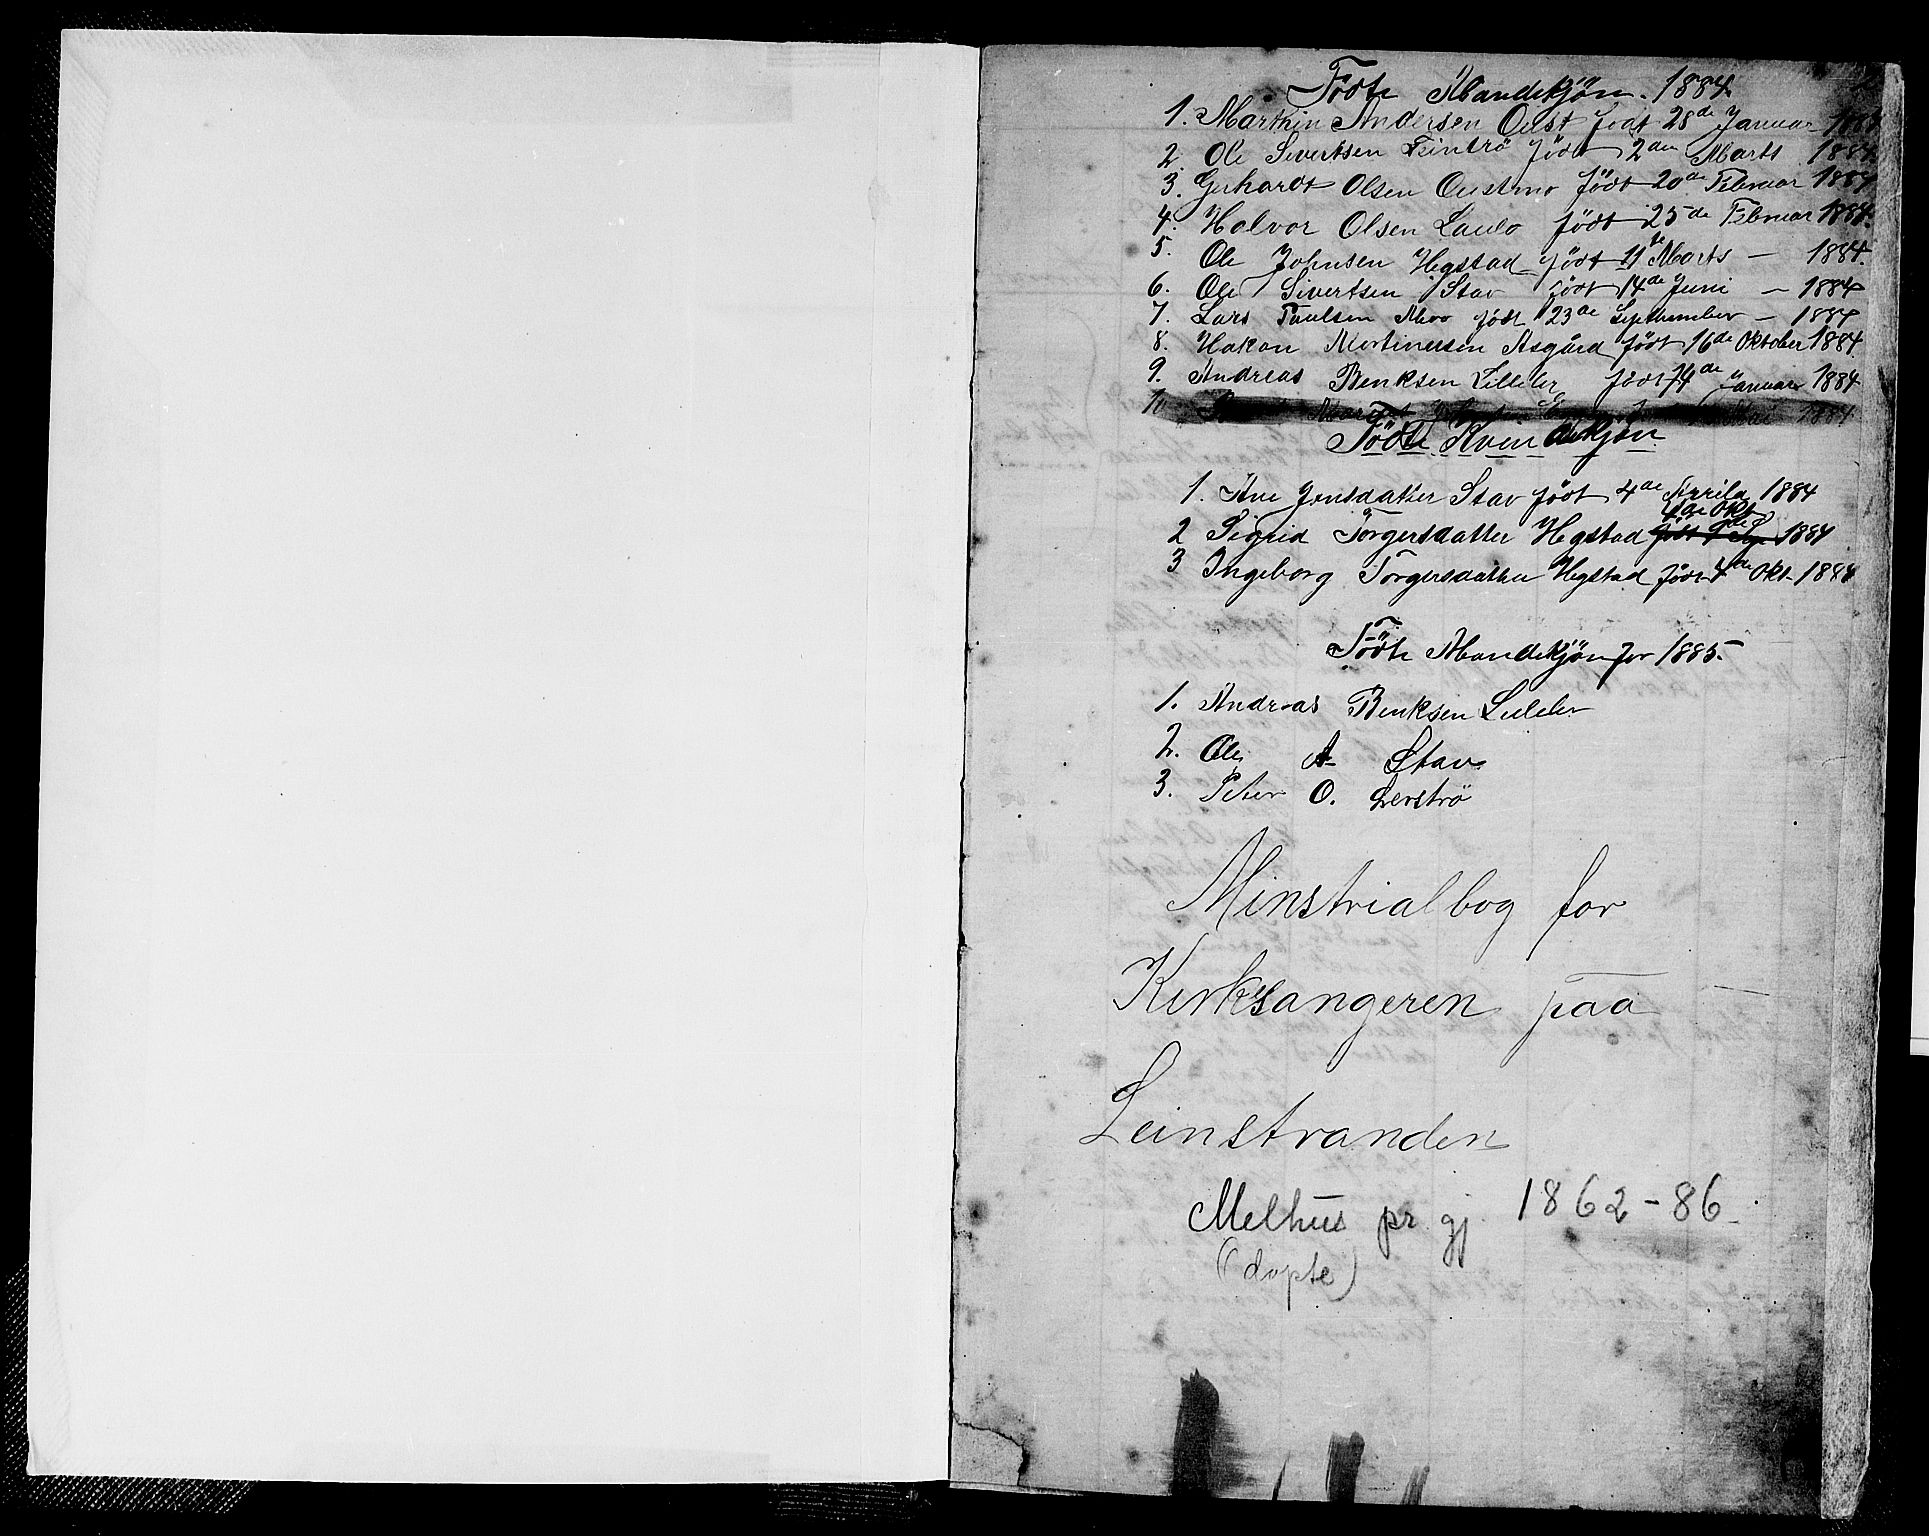 SAT, Ministerialprotokoller, klokkerbøker og fødselsregistre - Sør-Trøndelag, 613/L0394: Parish register (copy) no. 613C02, 1862-1886, p. 2